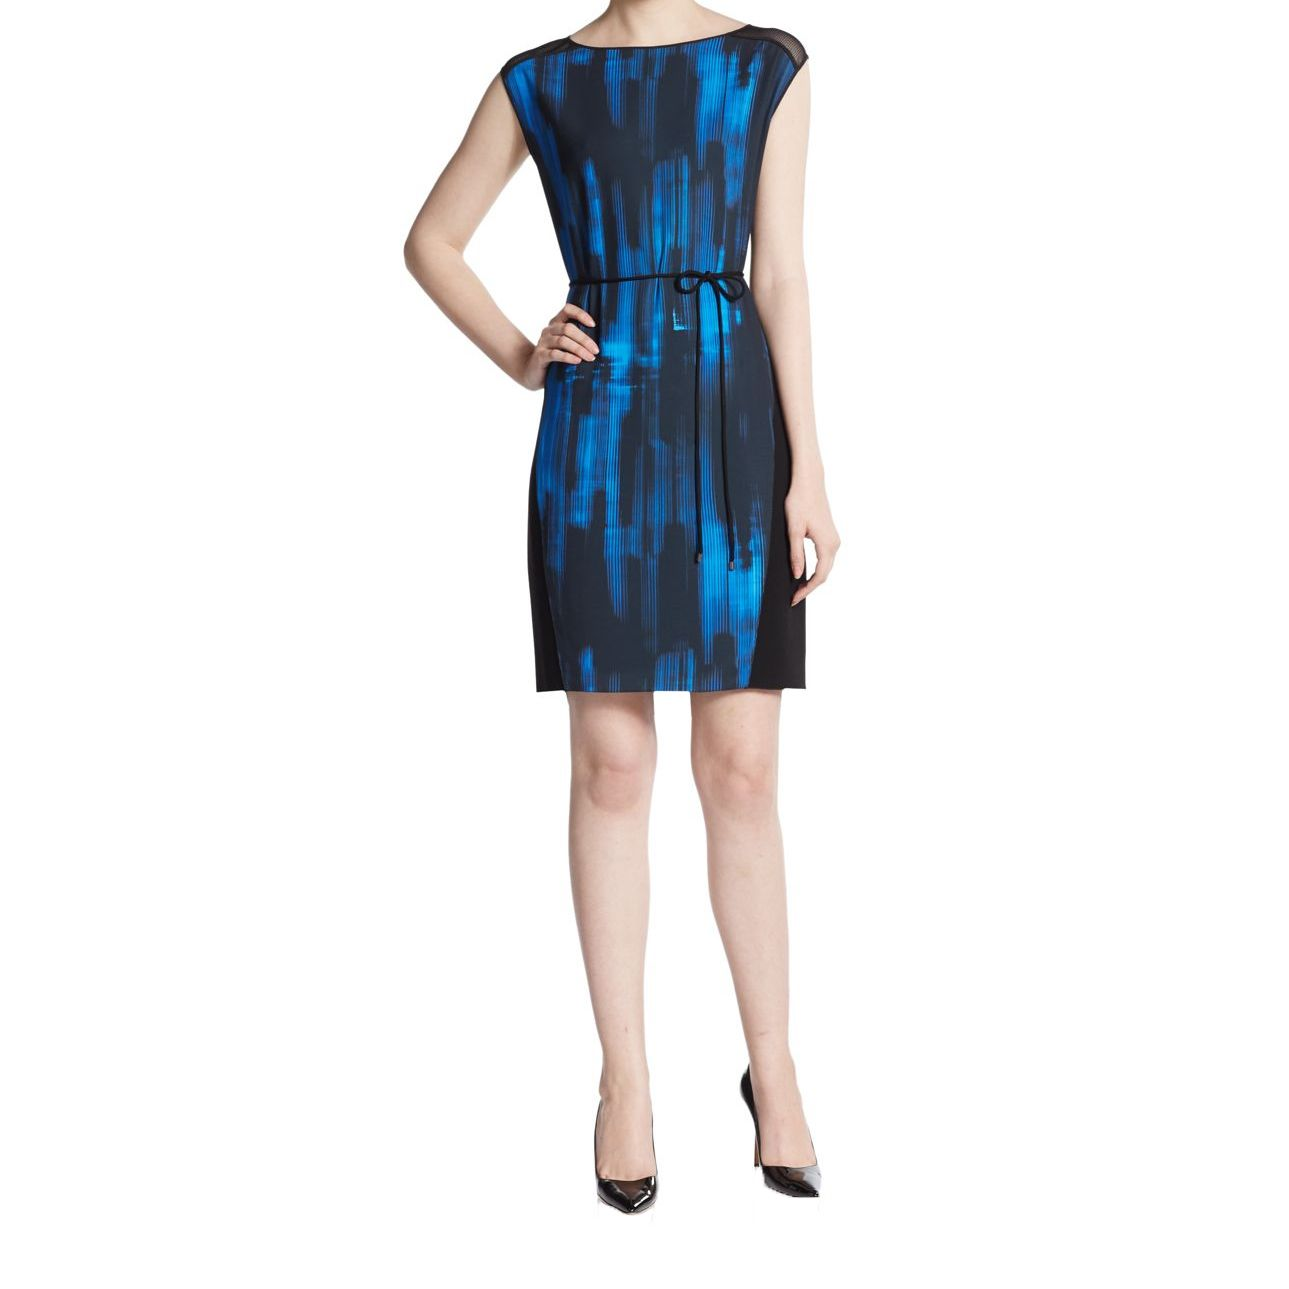 Elie Tahari Logan Women's Blue Dress